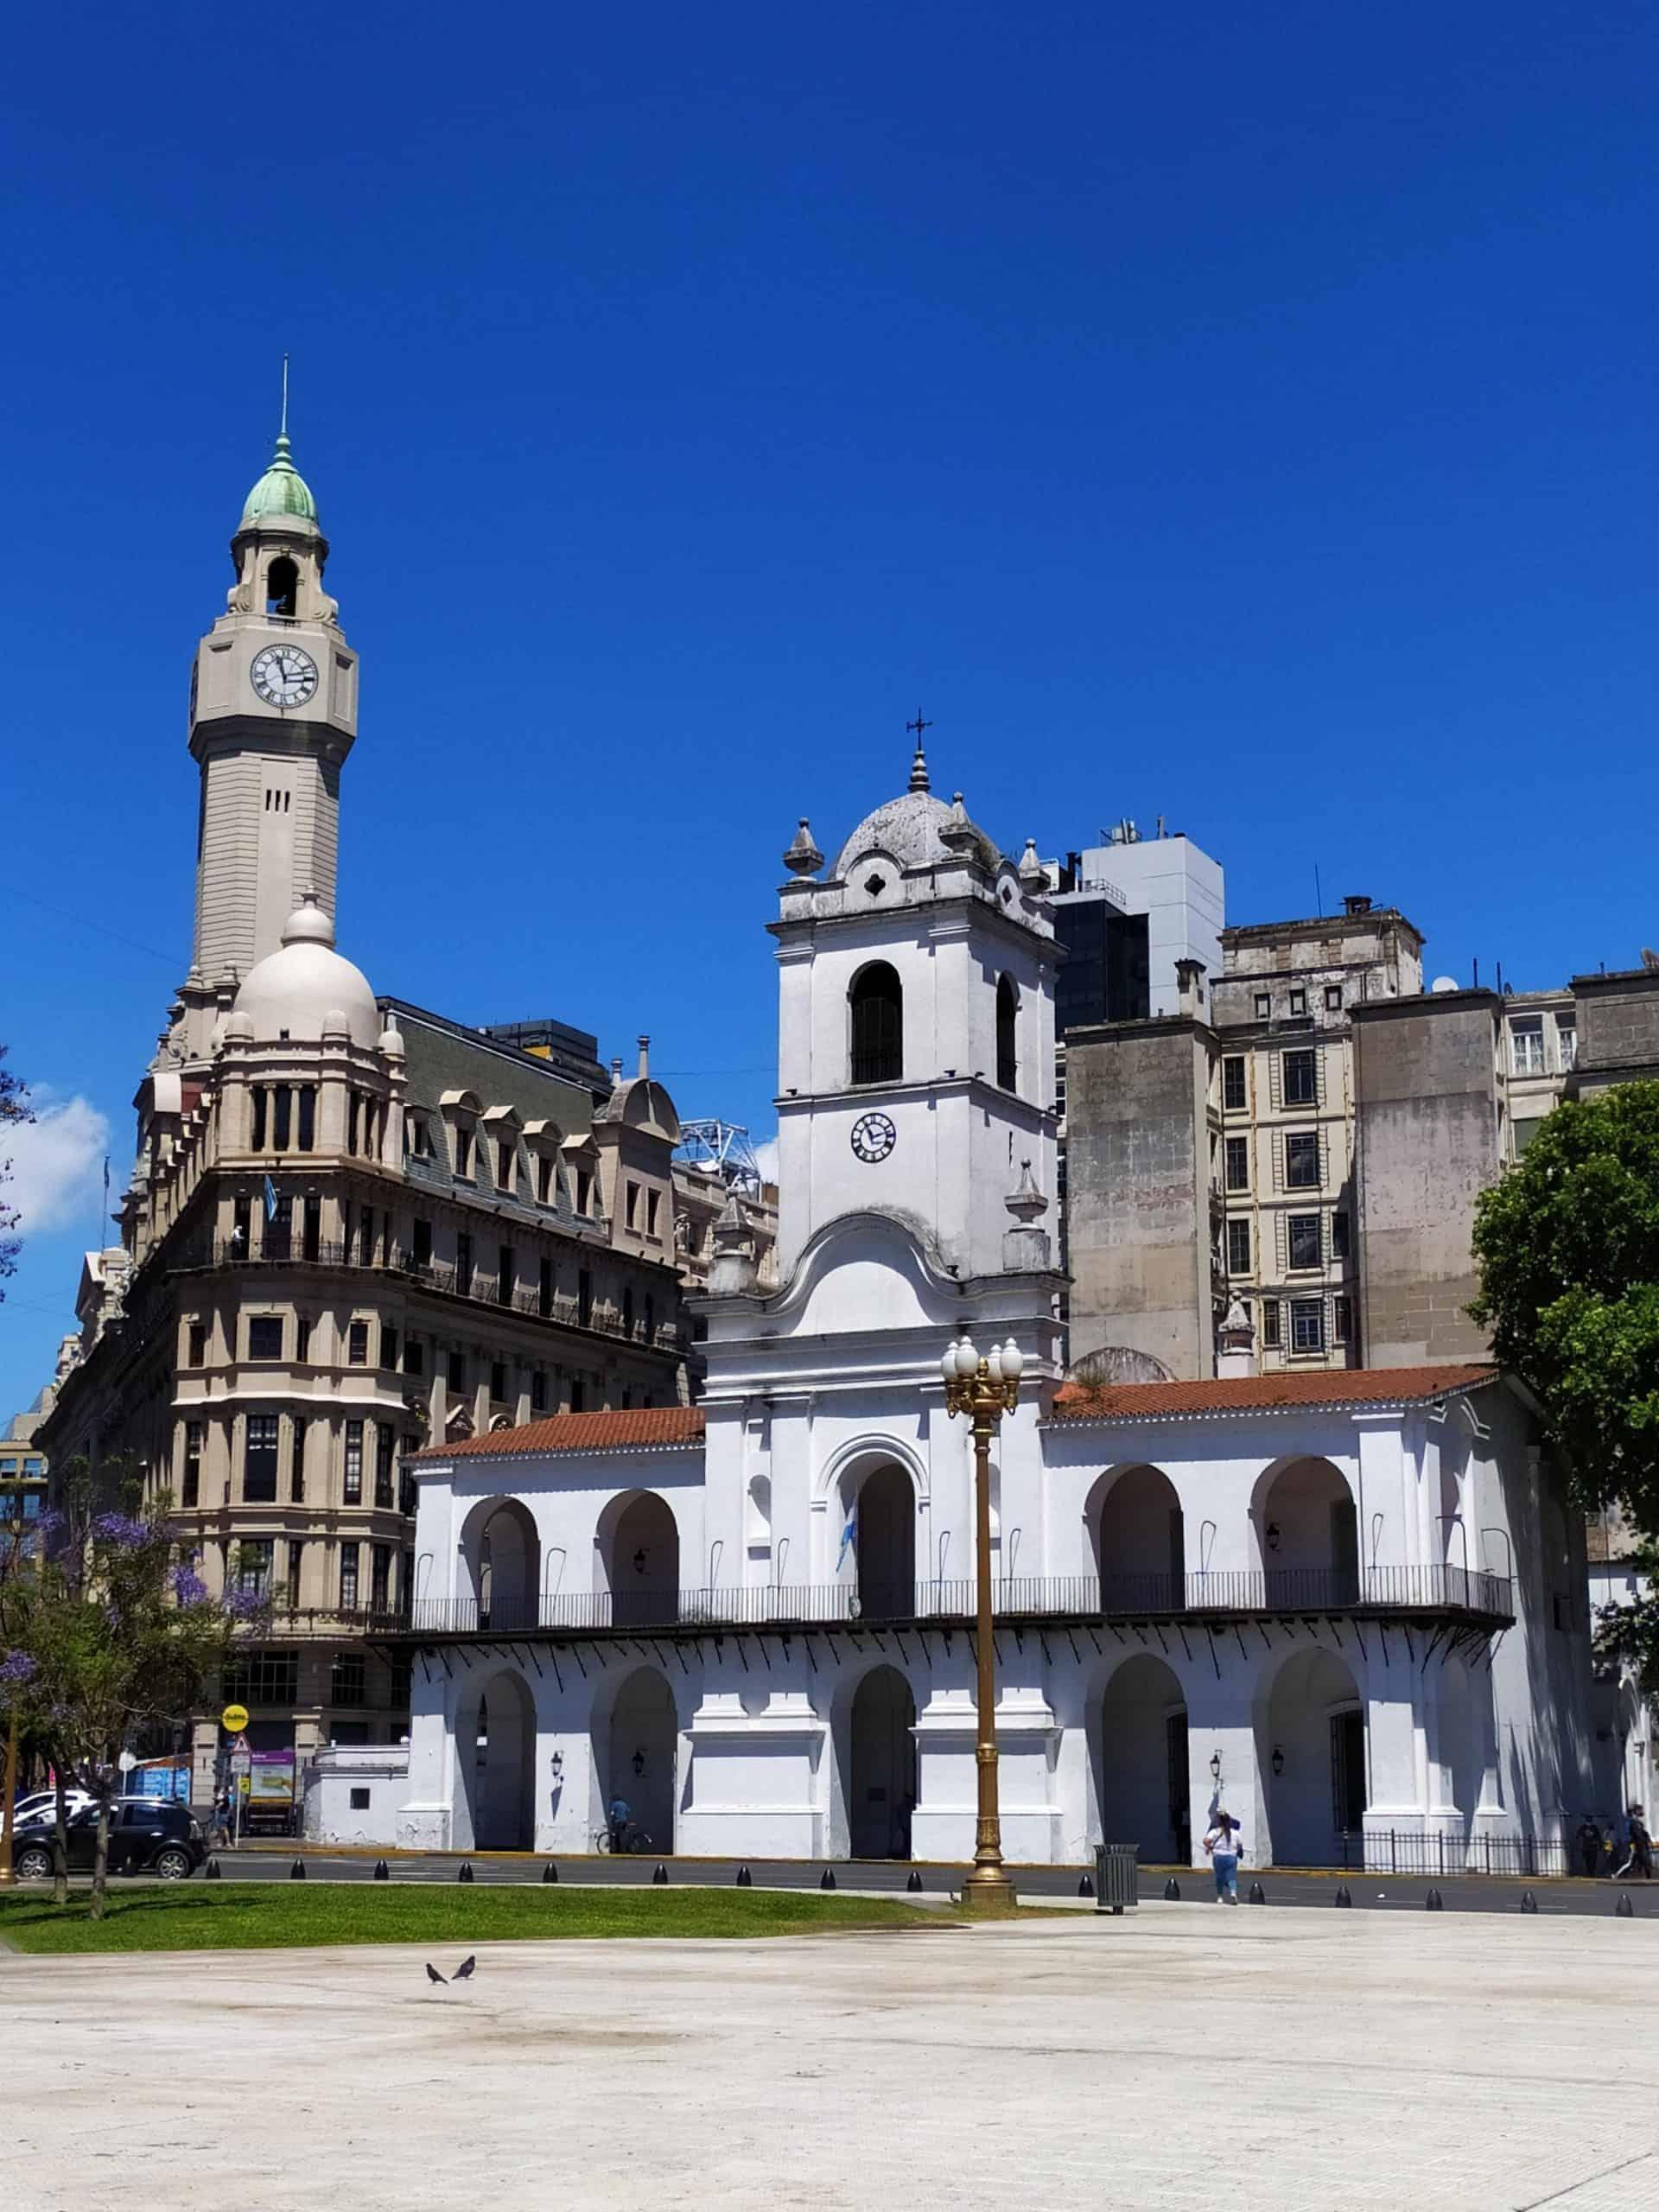 Essentialbuenosaires_tourpoint4_plazademayo,cabildoandcathedral_cabildoandcitycouncil_2